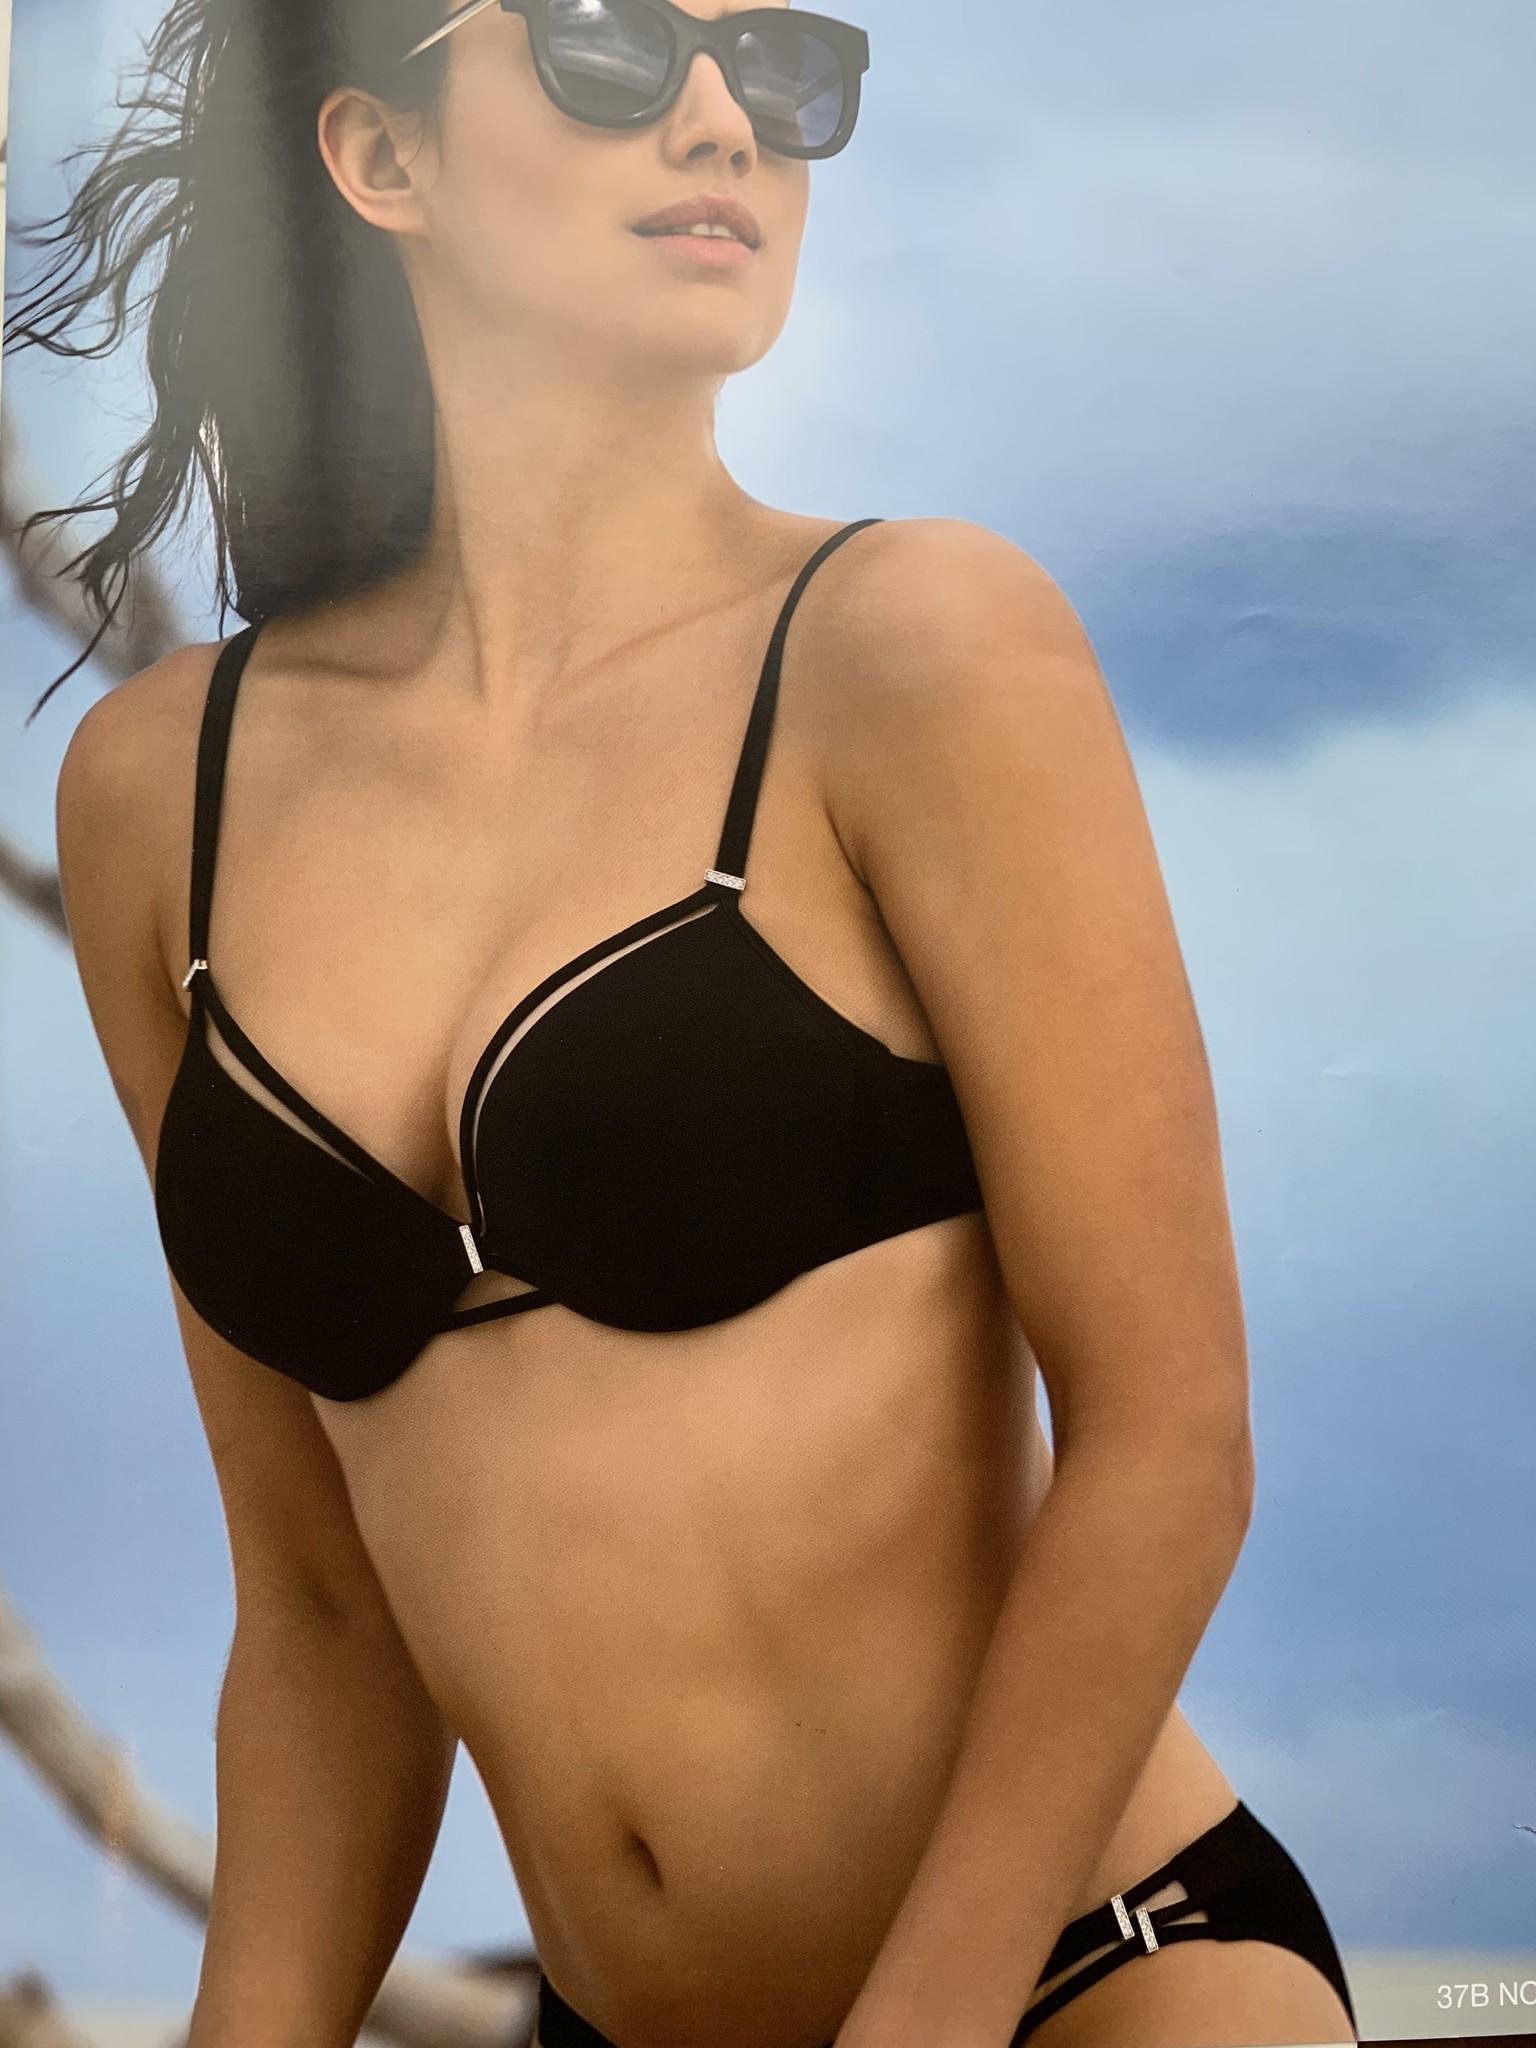 Lise Charmel Badmode Diam Audace bikini slip ABA0437